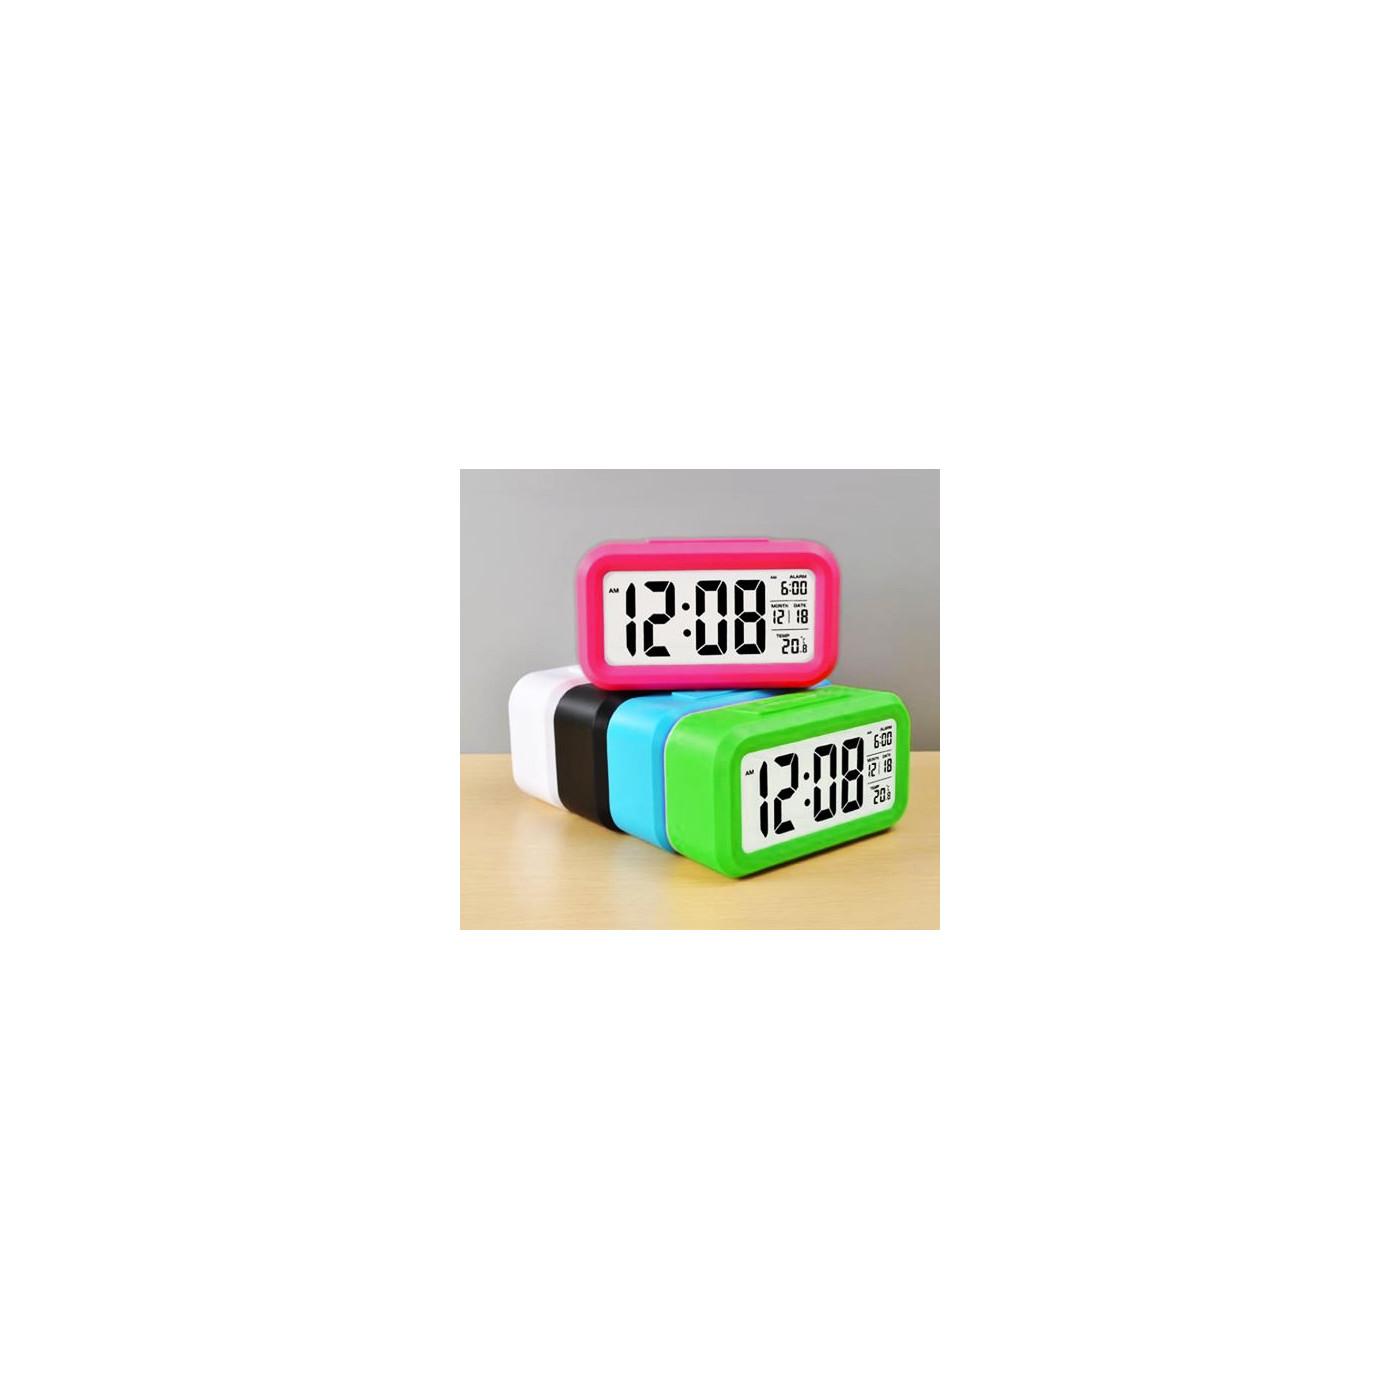 Moderne alarmklok/wekker in vrolijke kleur: zwart  - 1